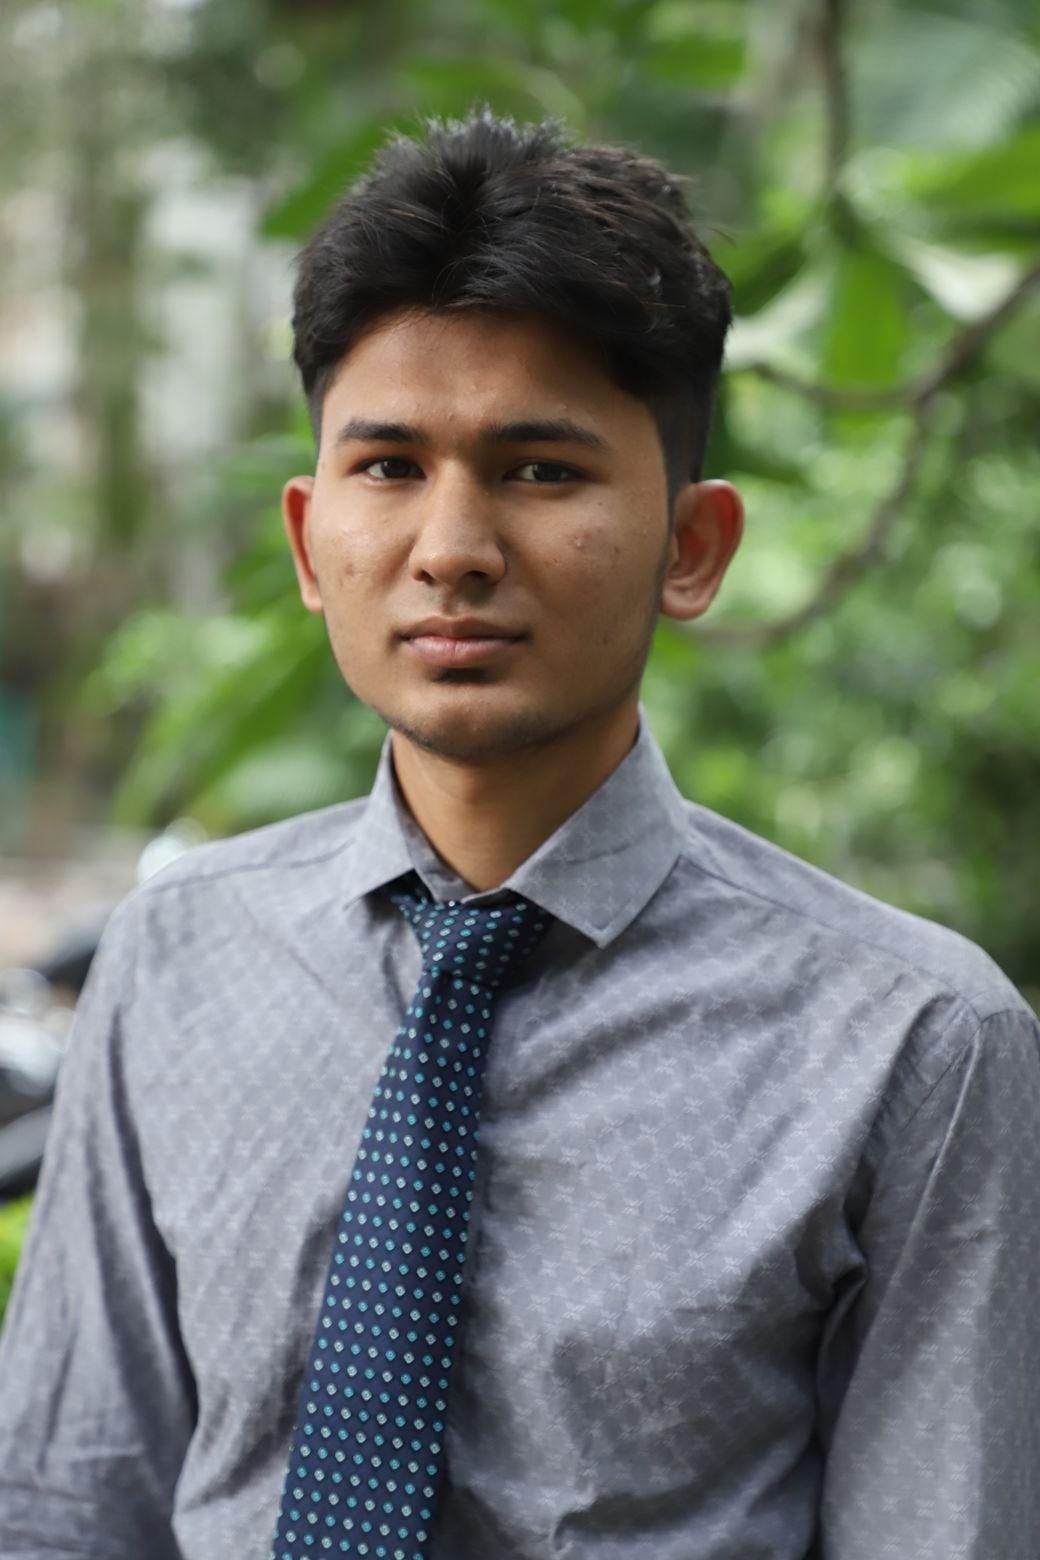 Mr. Hamza Shaikh